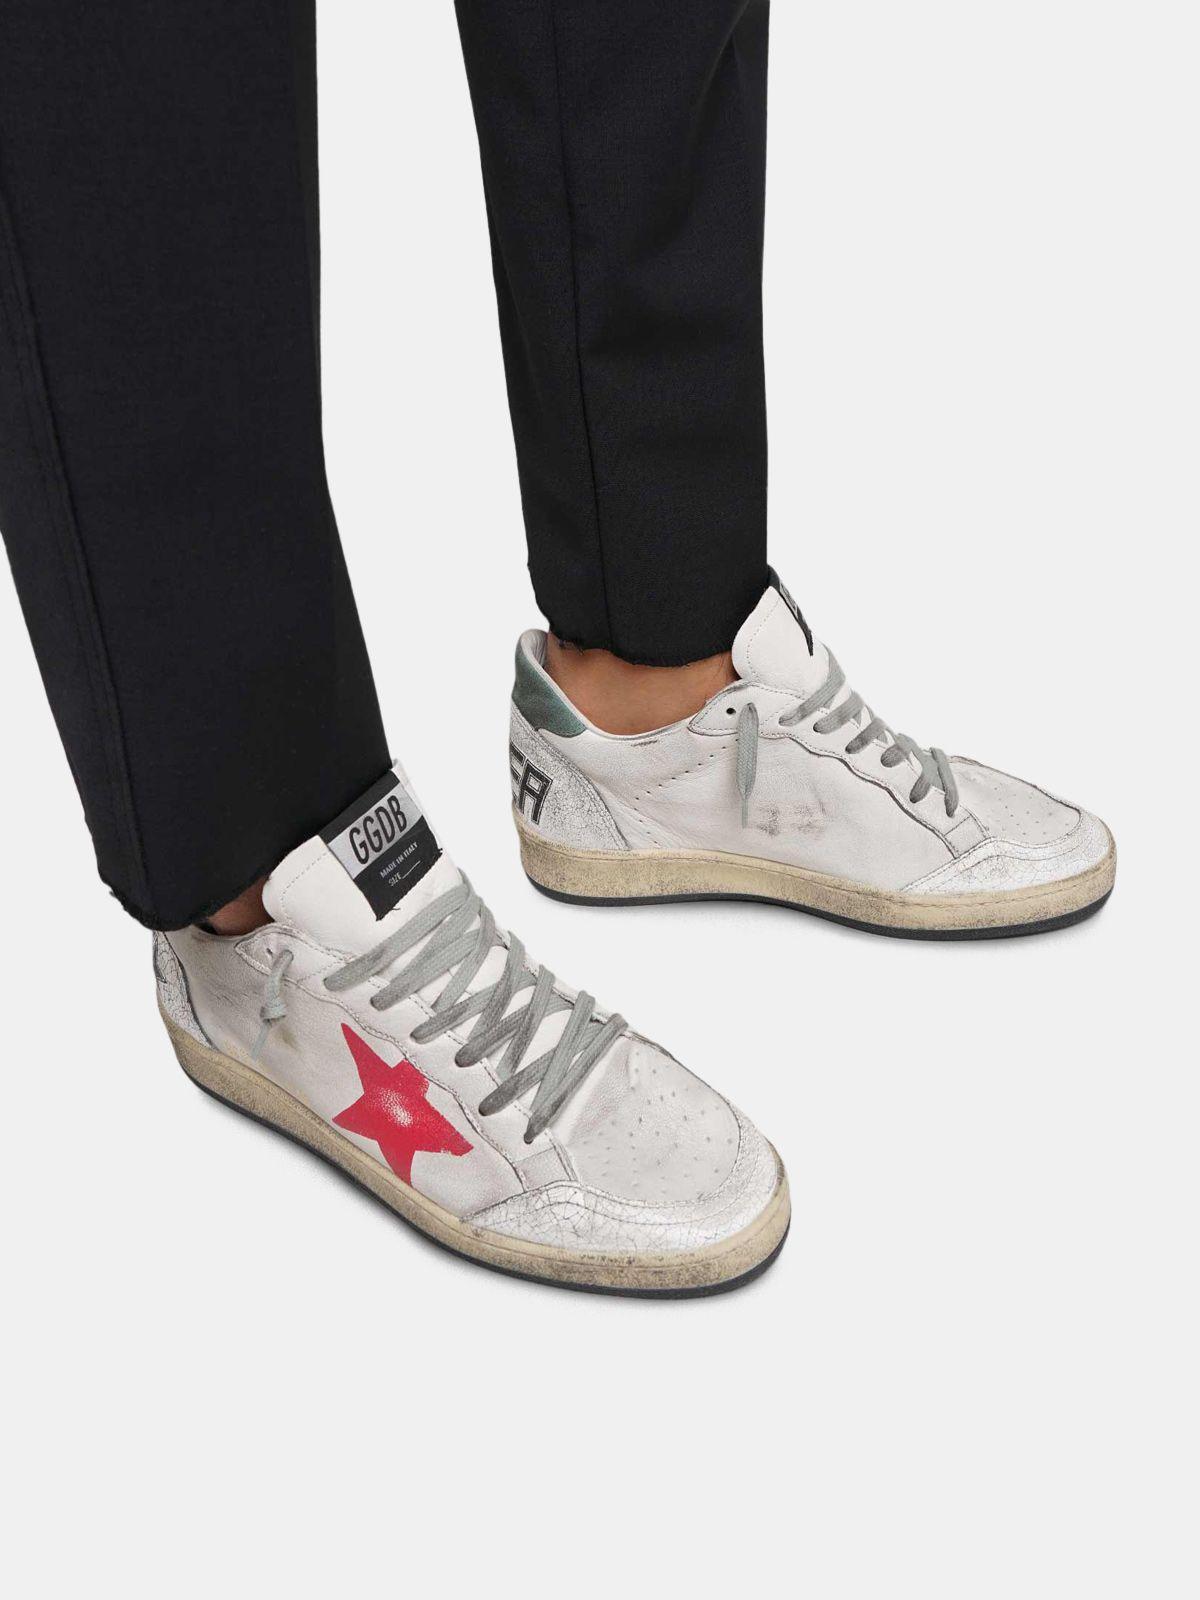 Golden Goose - Sneakers Ball Star in pelle cracklé con stella rossa dipinta a mano in